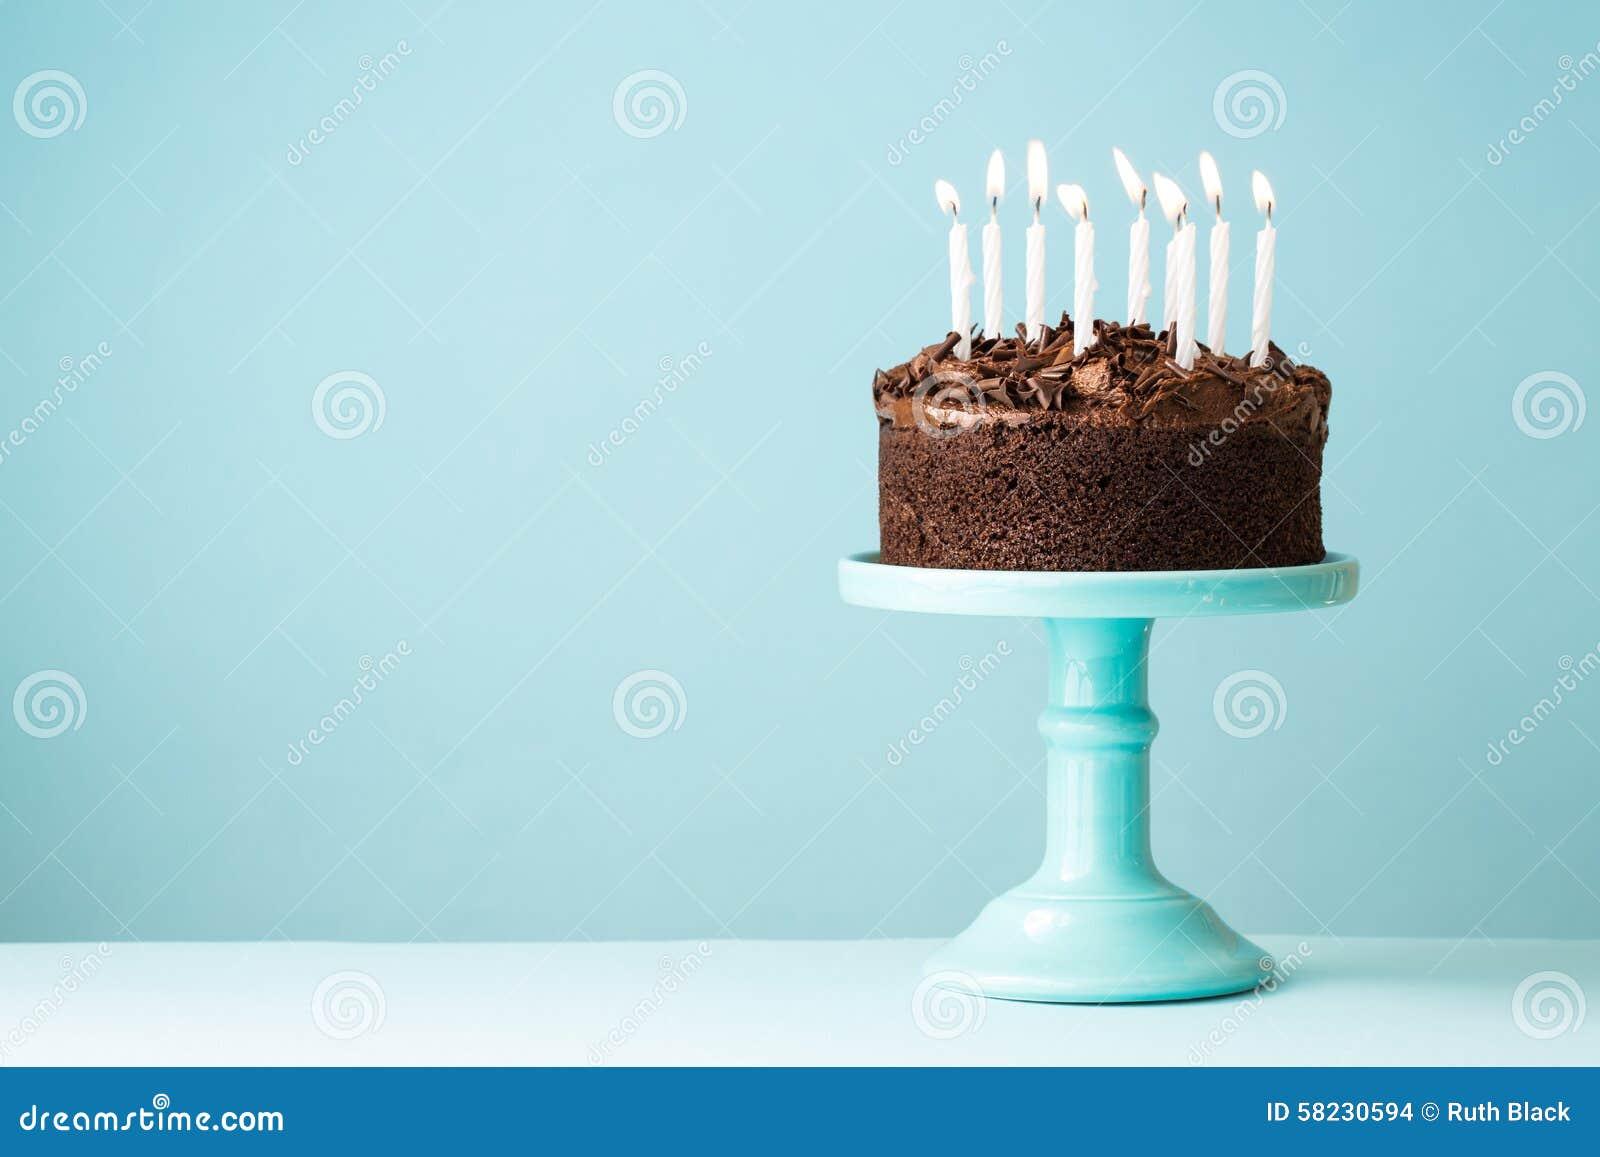 Birthday Cake Stock Photo Image Of Frosting Copyspace